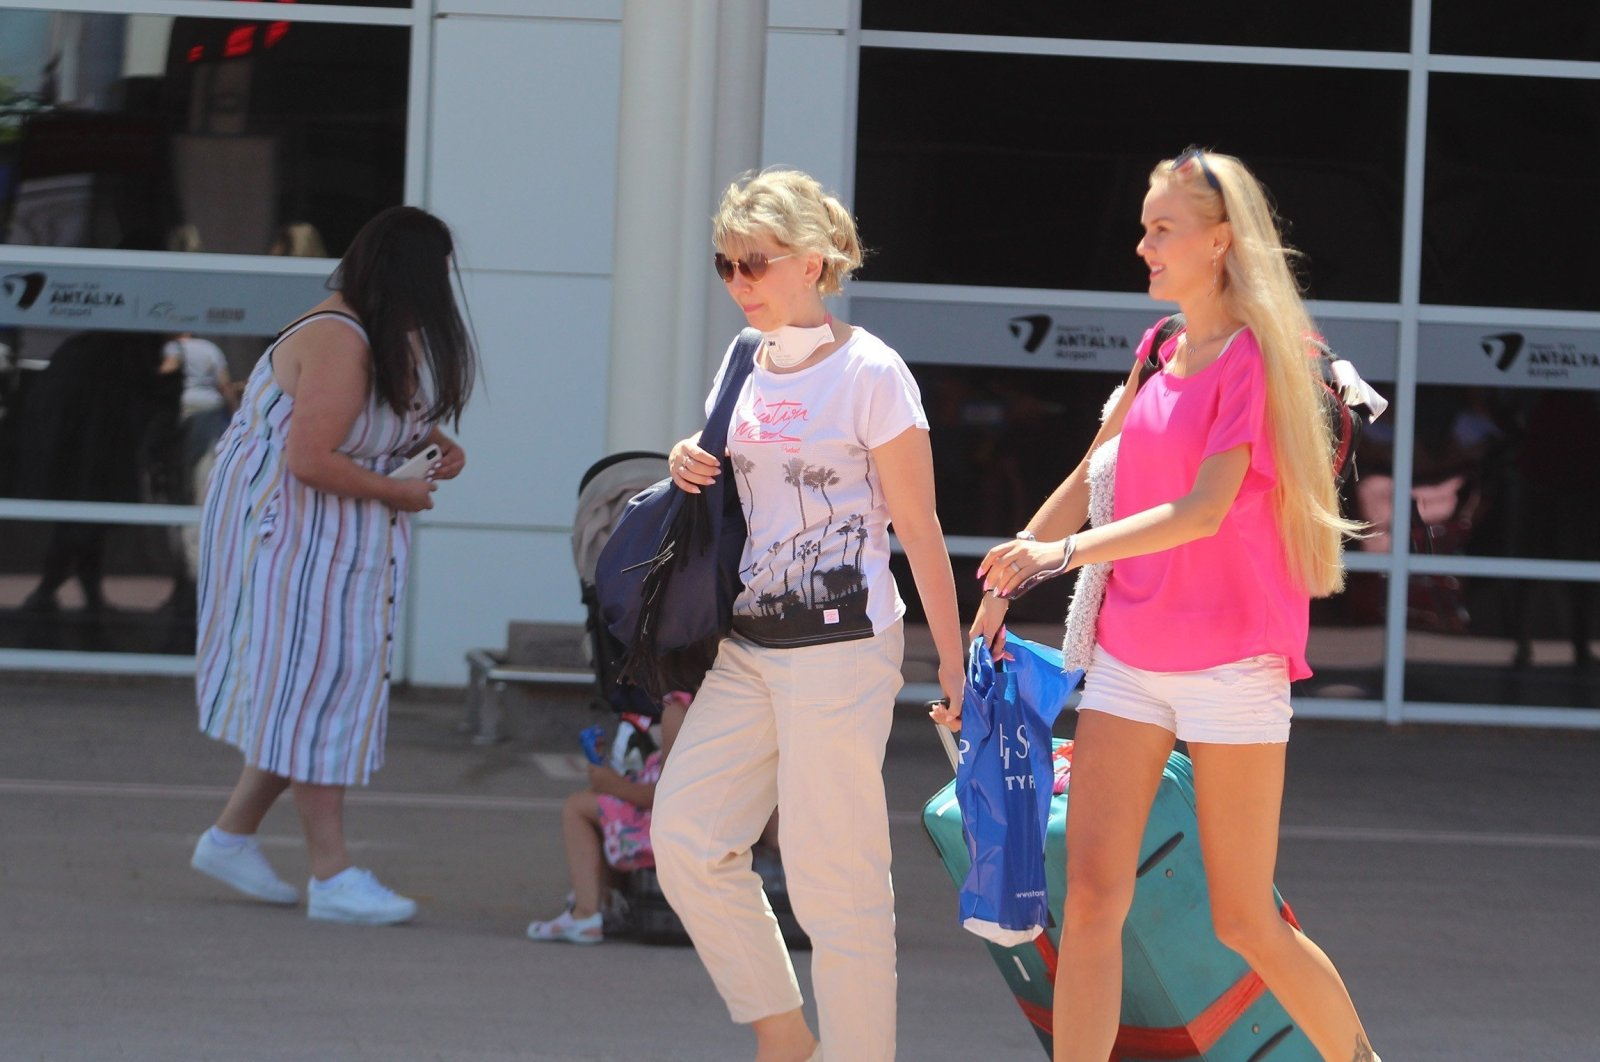 Tourists arrive at Antalya Airport in Antalya, southern Turkey, Sept. 17, 2020. (IHA Photo)